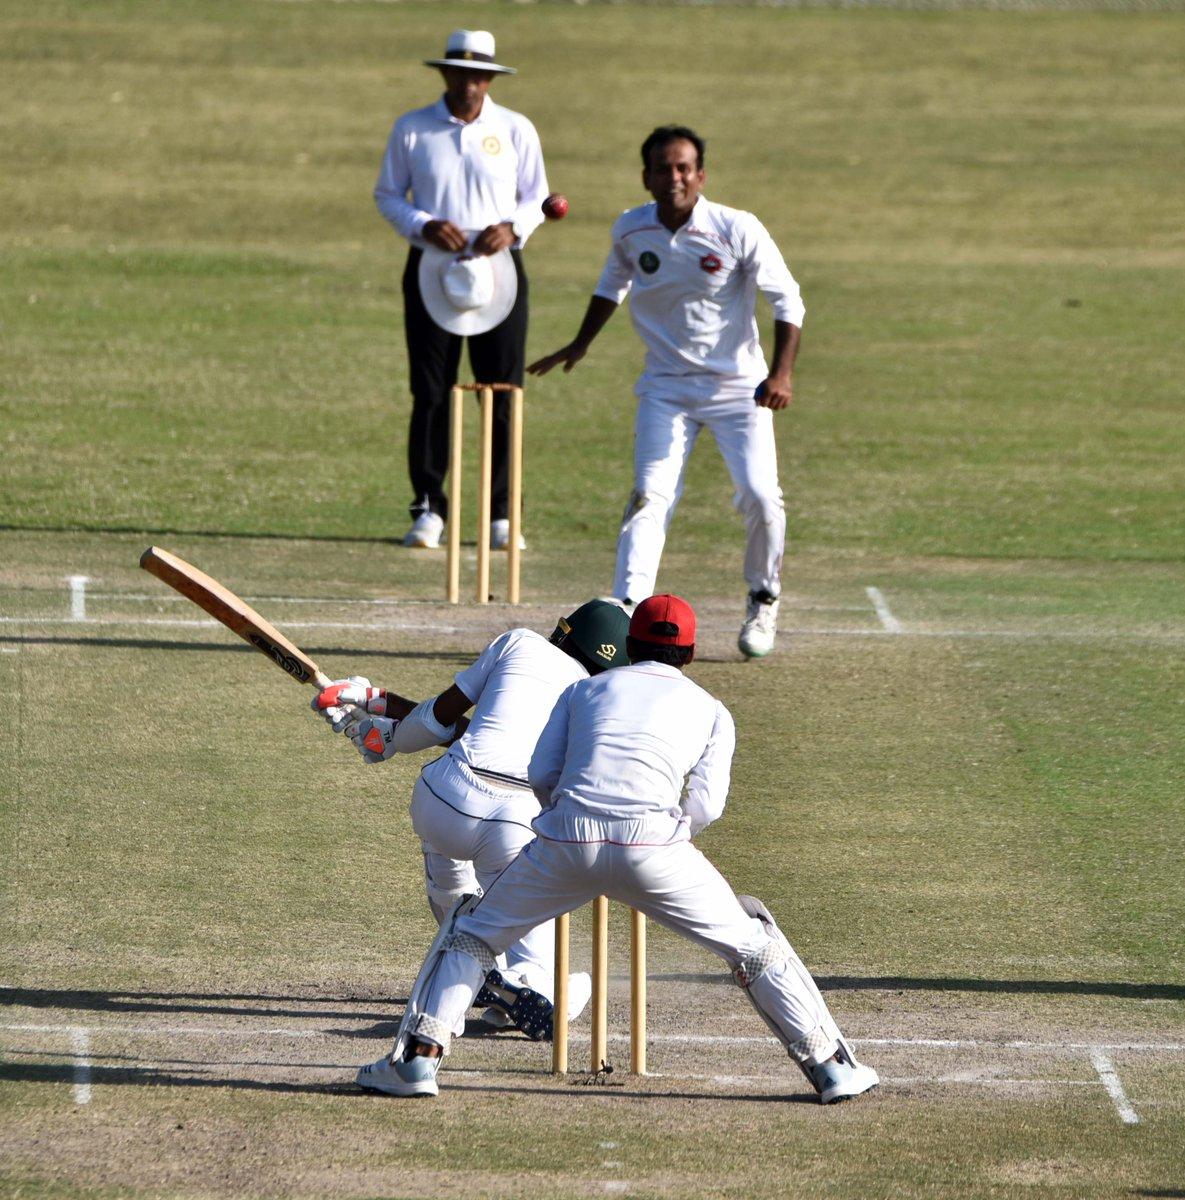 Nauman Ali's nine-wicket haul leads Northern to 145-run win over Sindh in Quaid-e-Azam Trophy